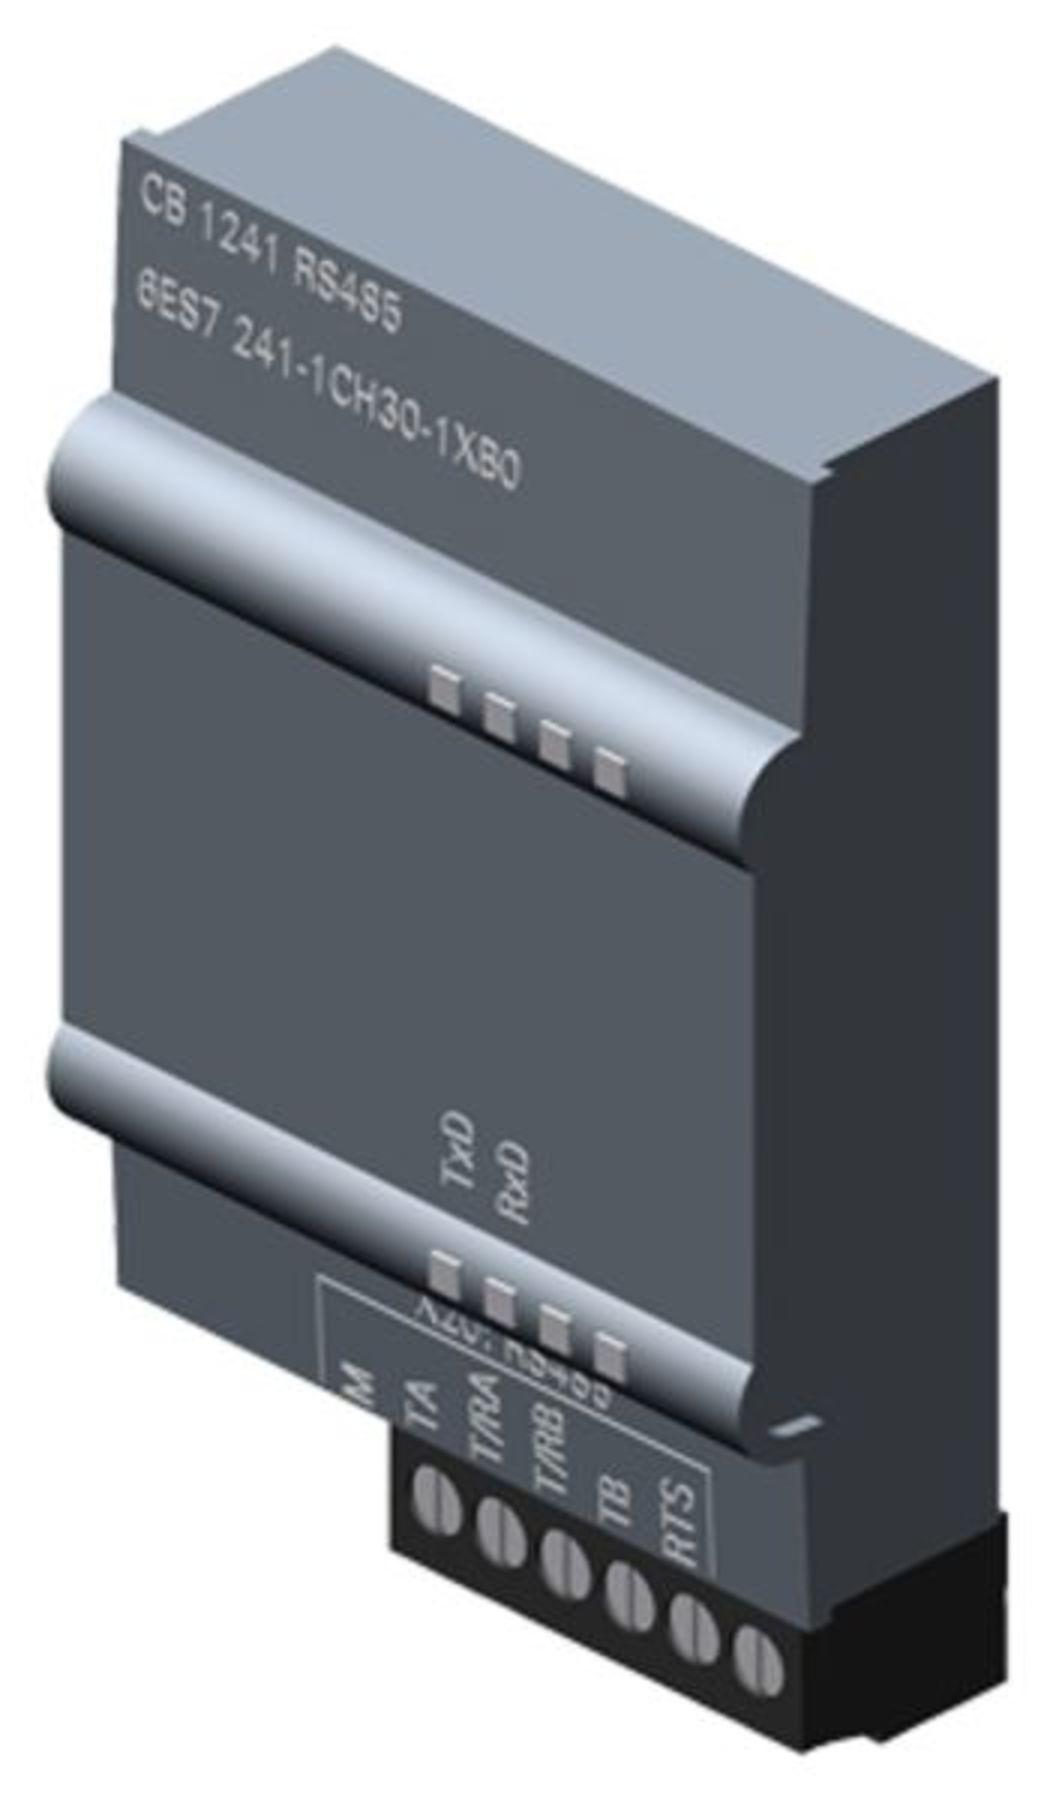 6es7241 1ch30 1xb0 Siemens Communication Module Cb1241 Simatic